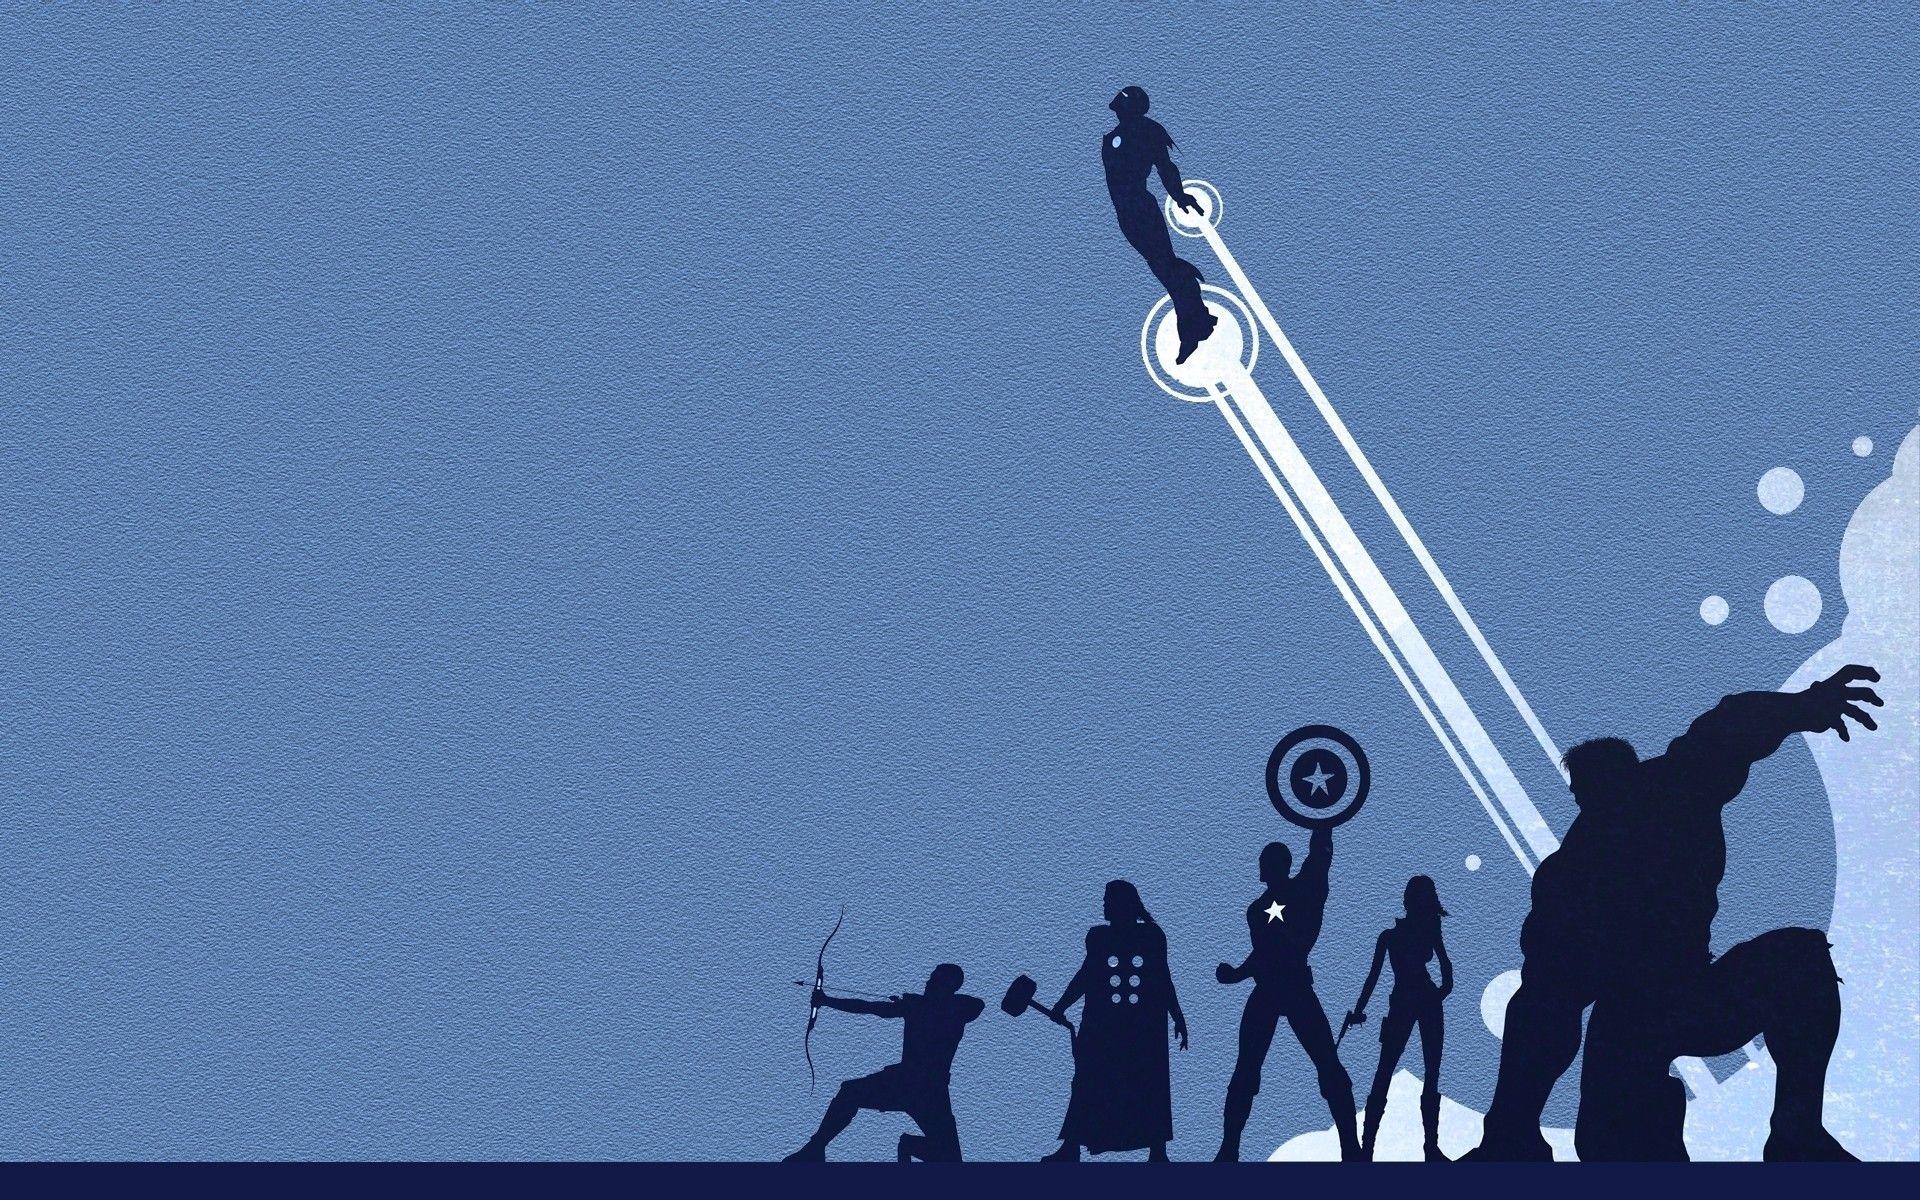 The Avengers Minimal Wallpaper Marvel Images Dc Comics Wallpaper Superhero Wallpaper